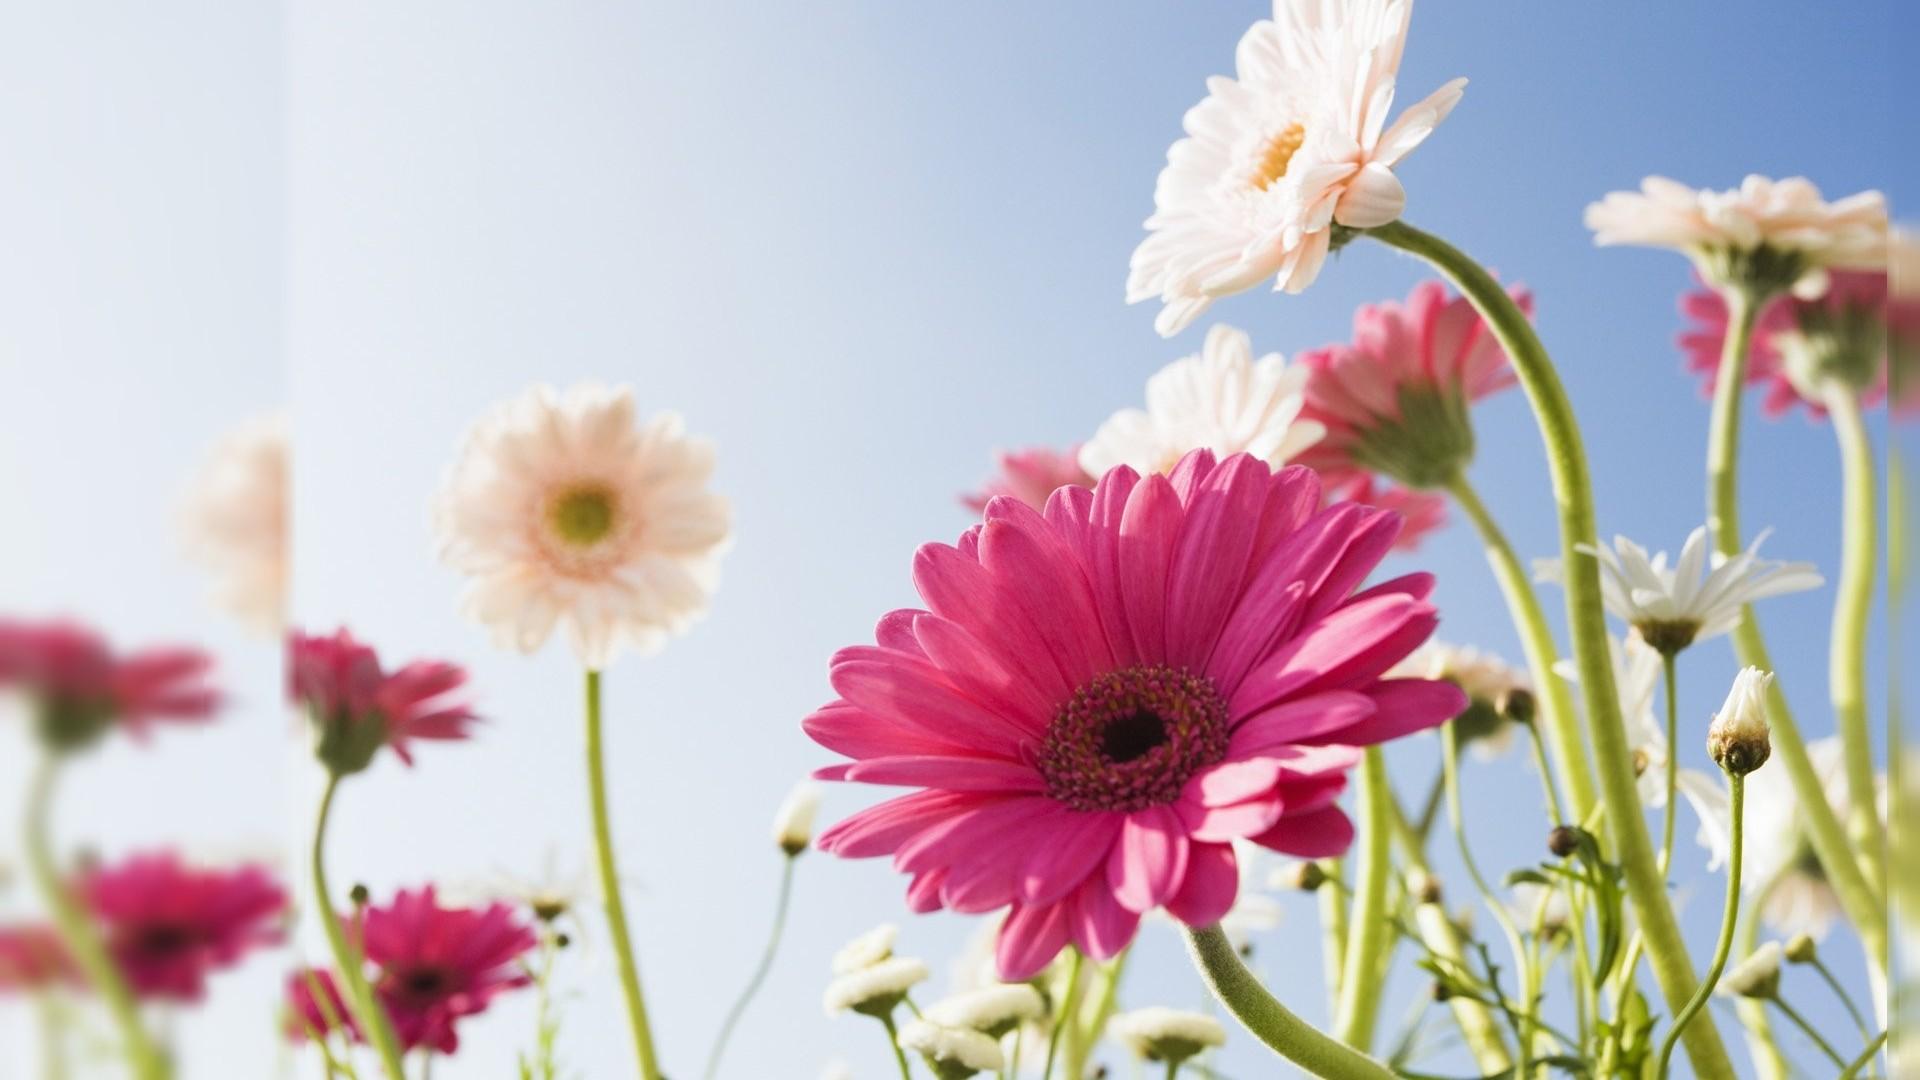 May Flowers Wallpaper Hd Desktop 66 Images